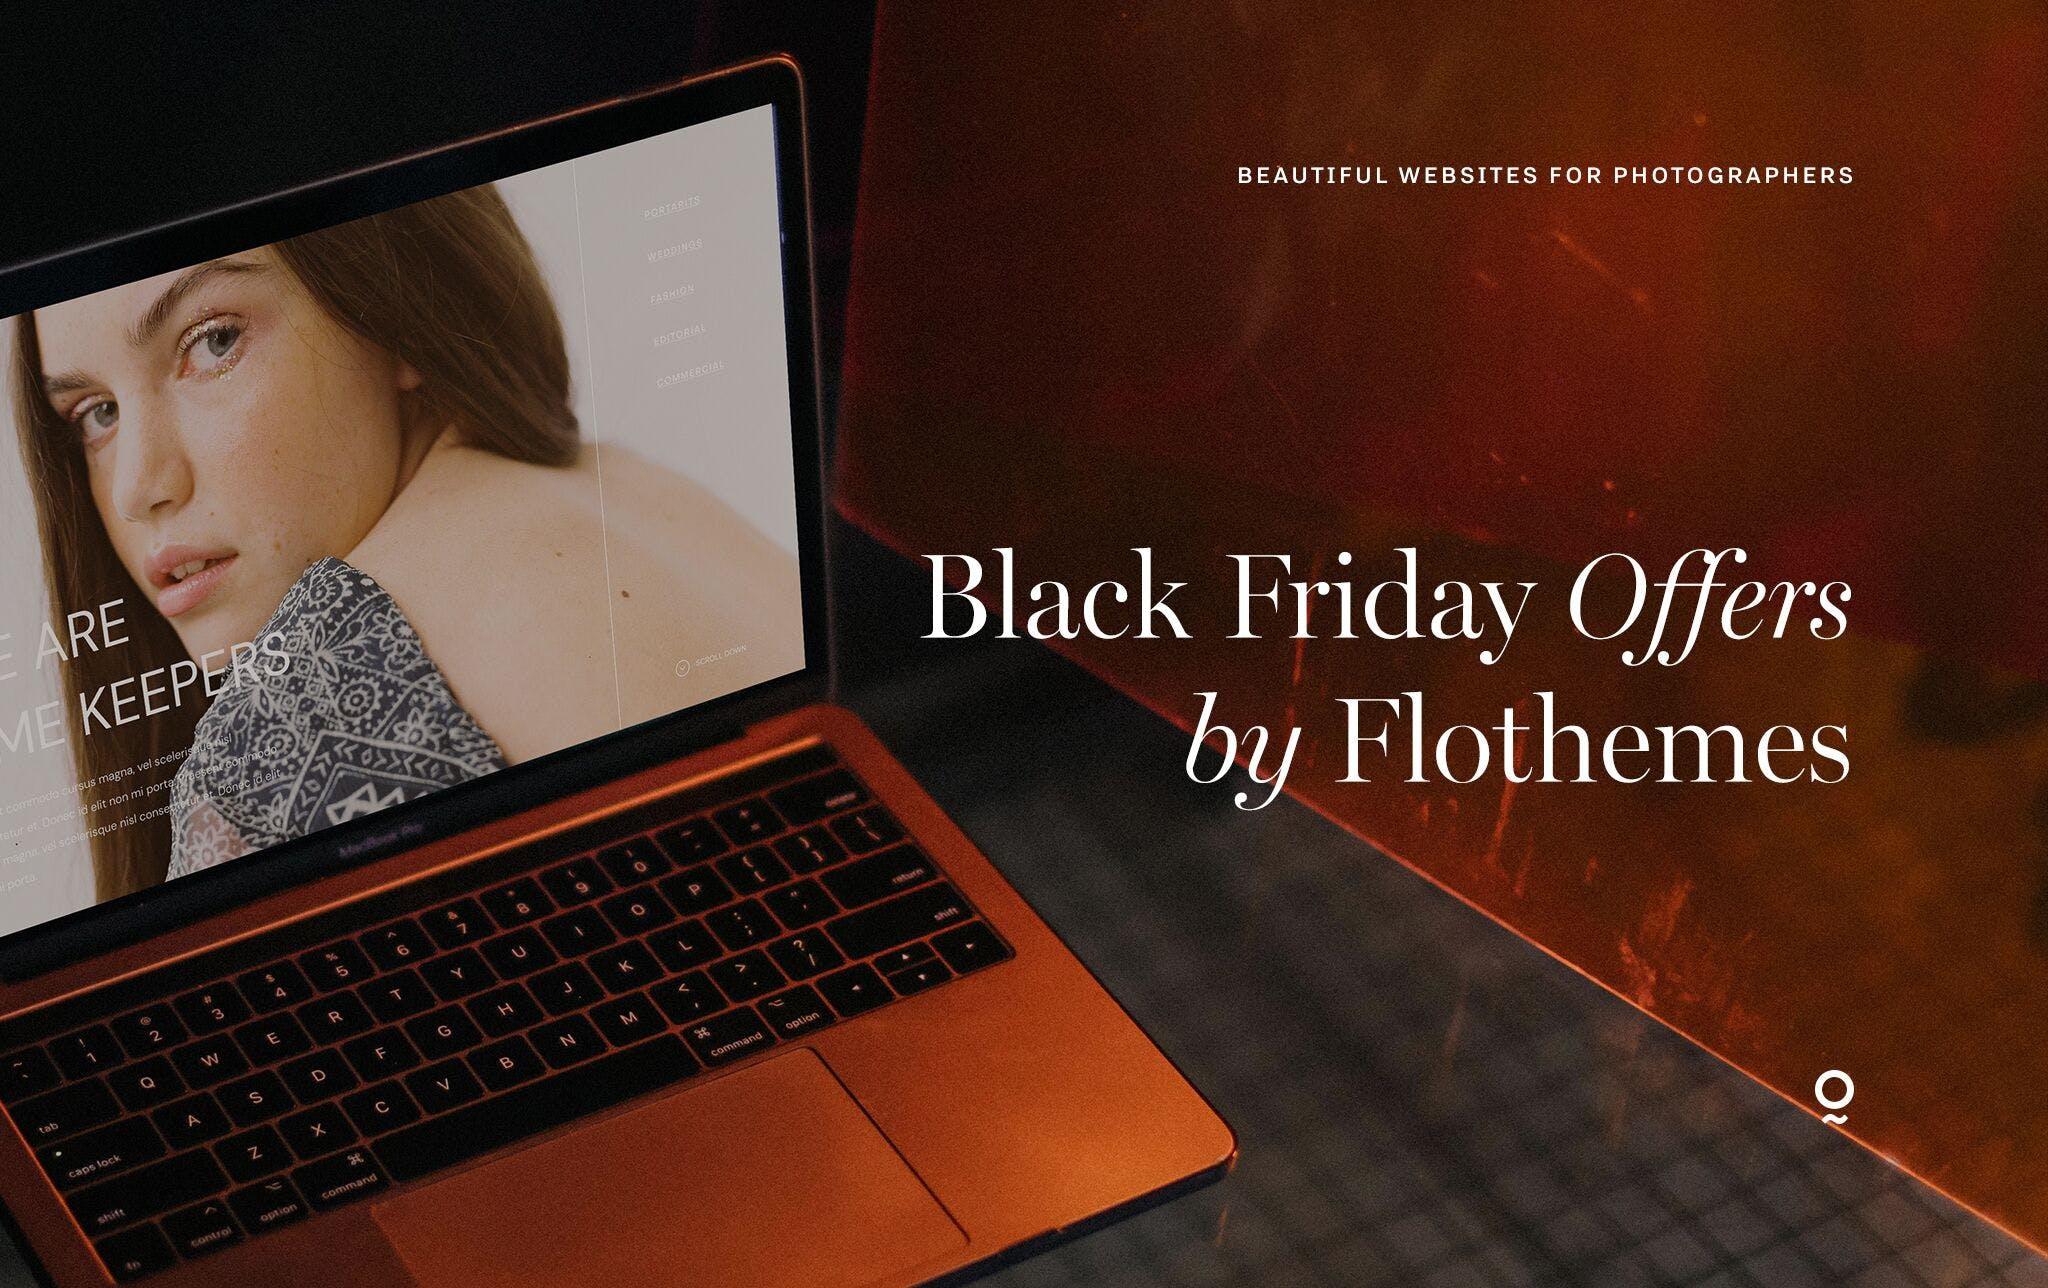 Flothemes Black Friday 2019 deal on website designs for photographers